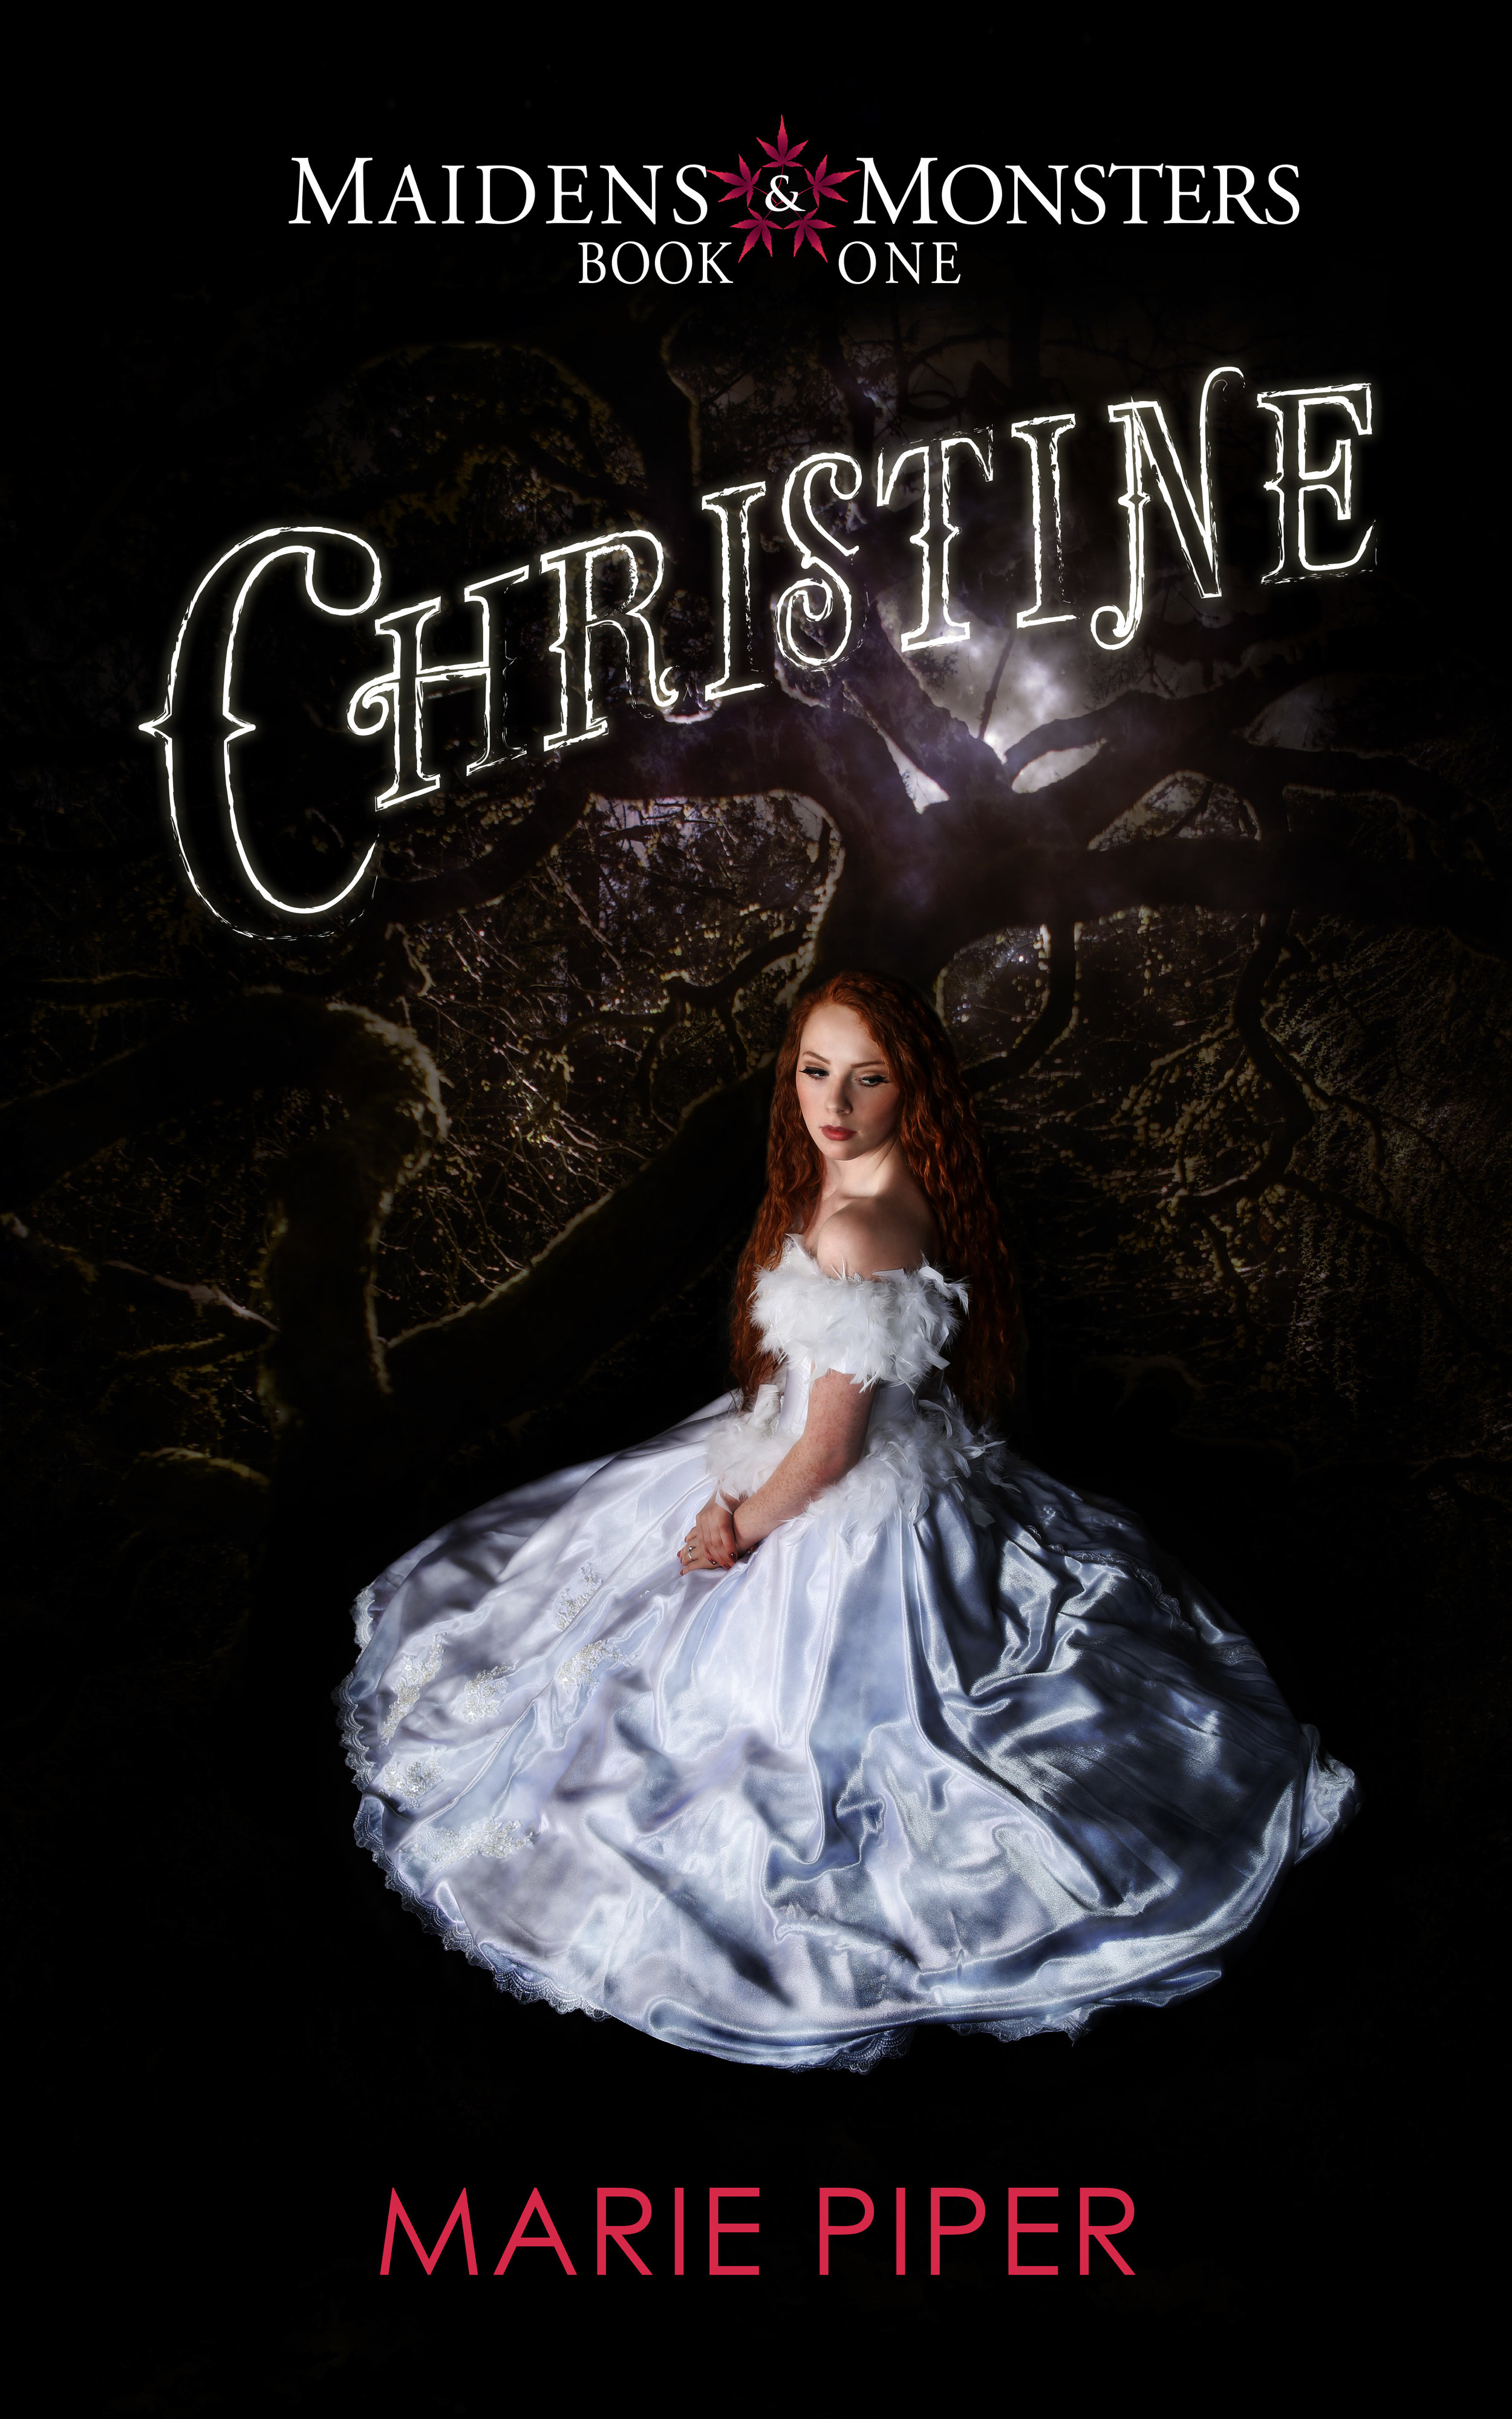 christine3.jpg